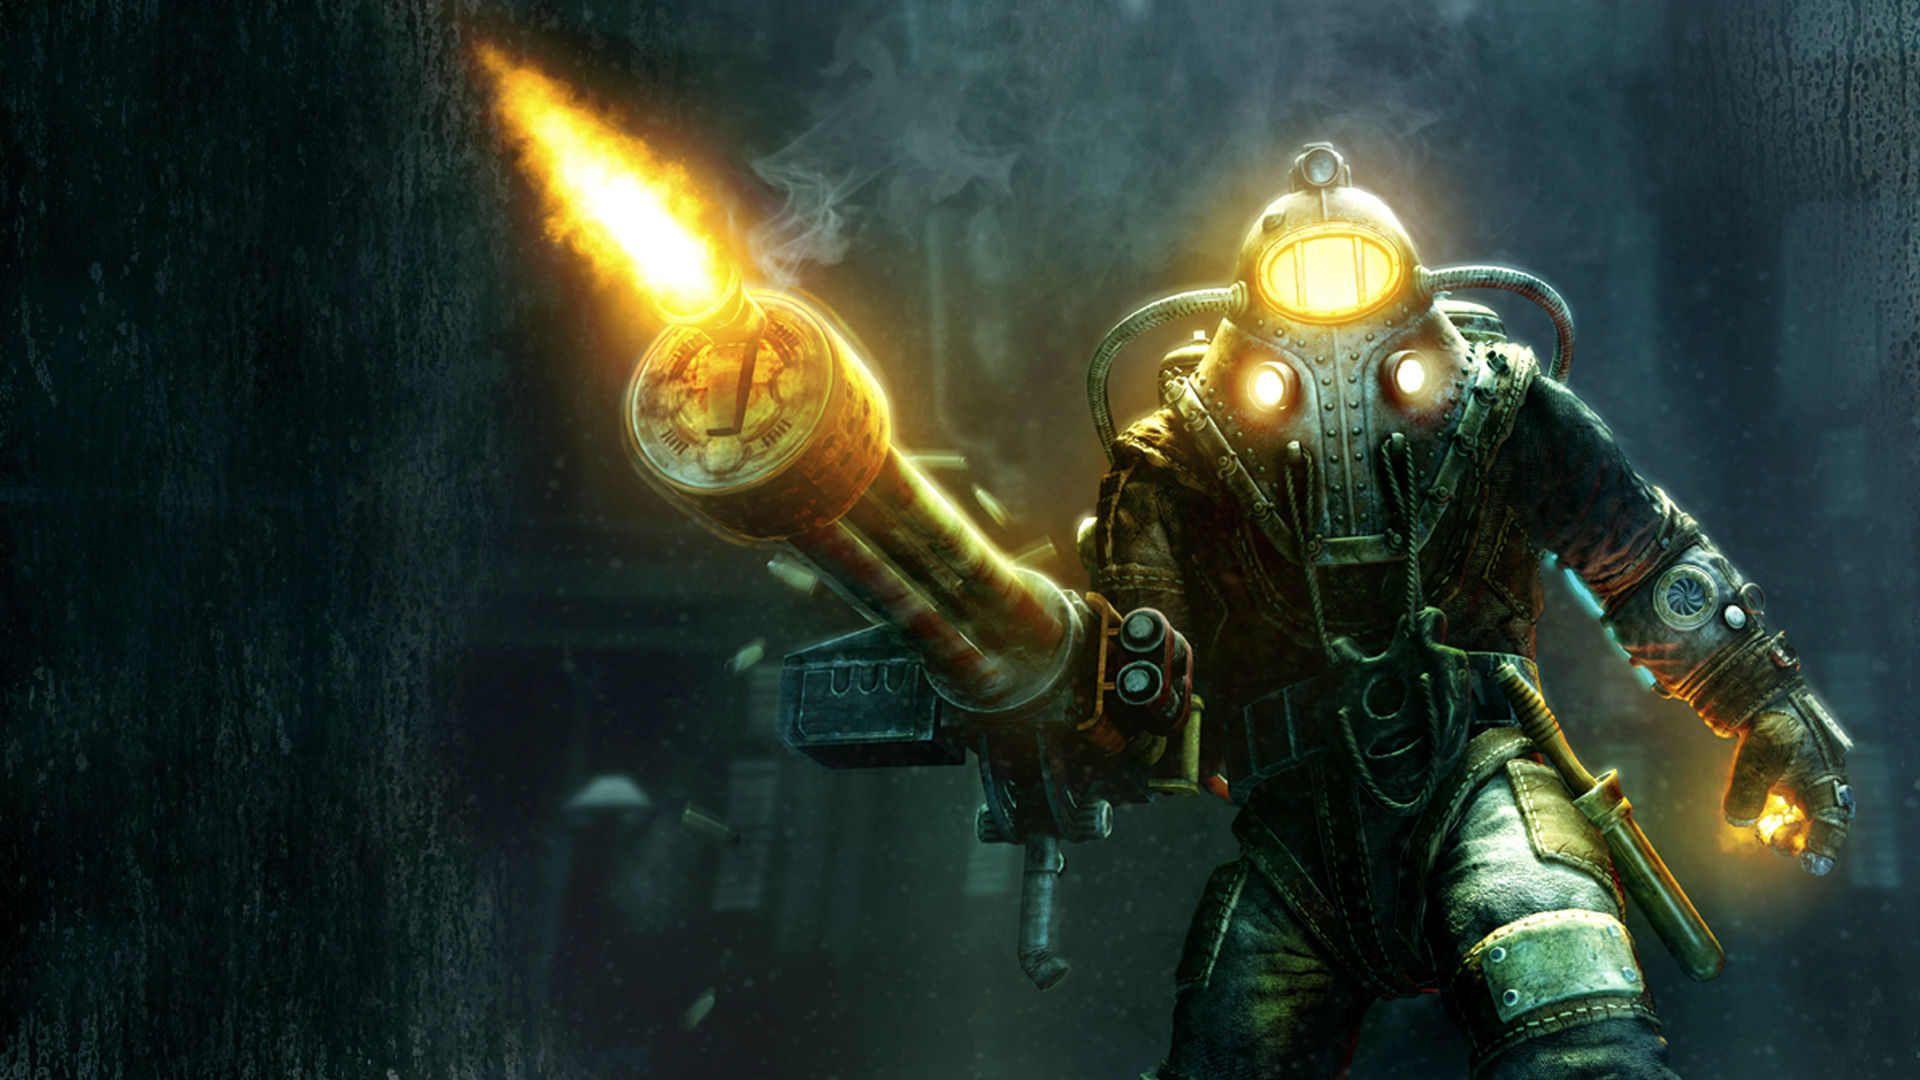 Big Daddy Alpha Series Bioshock Bioshock Bioshock Game